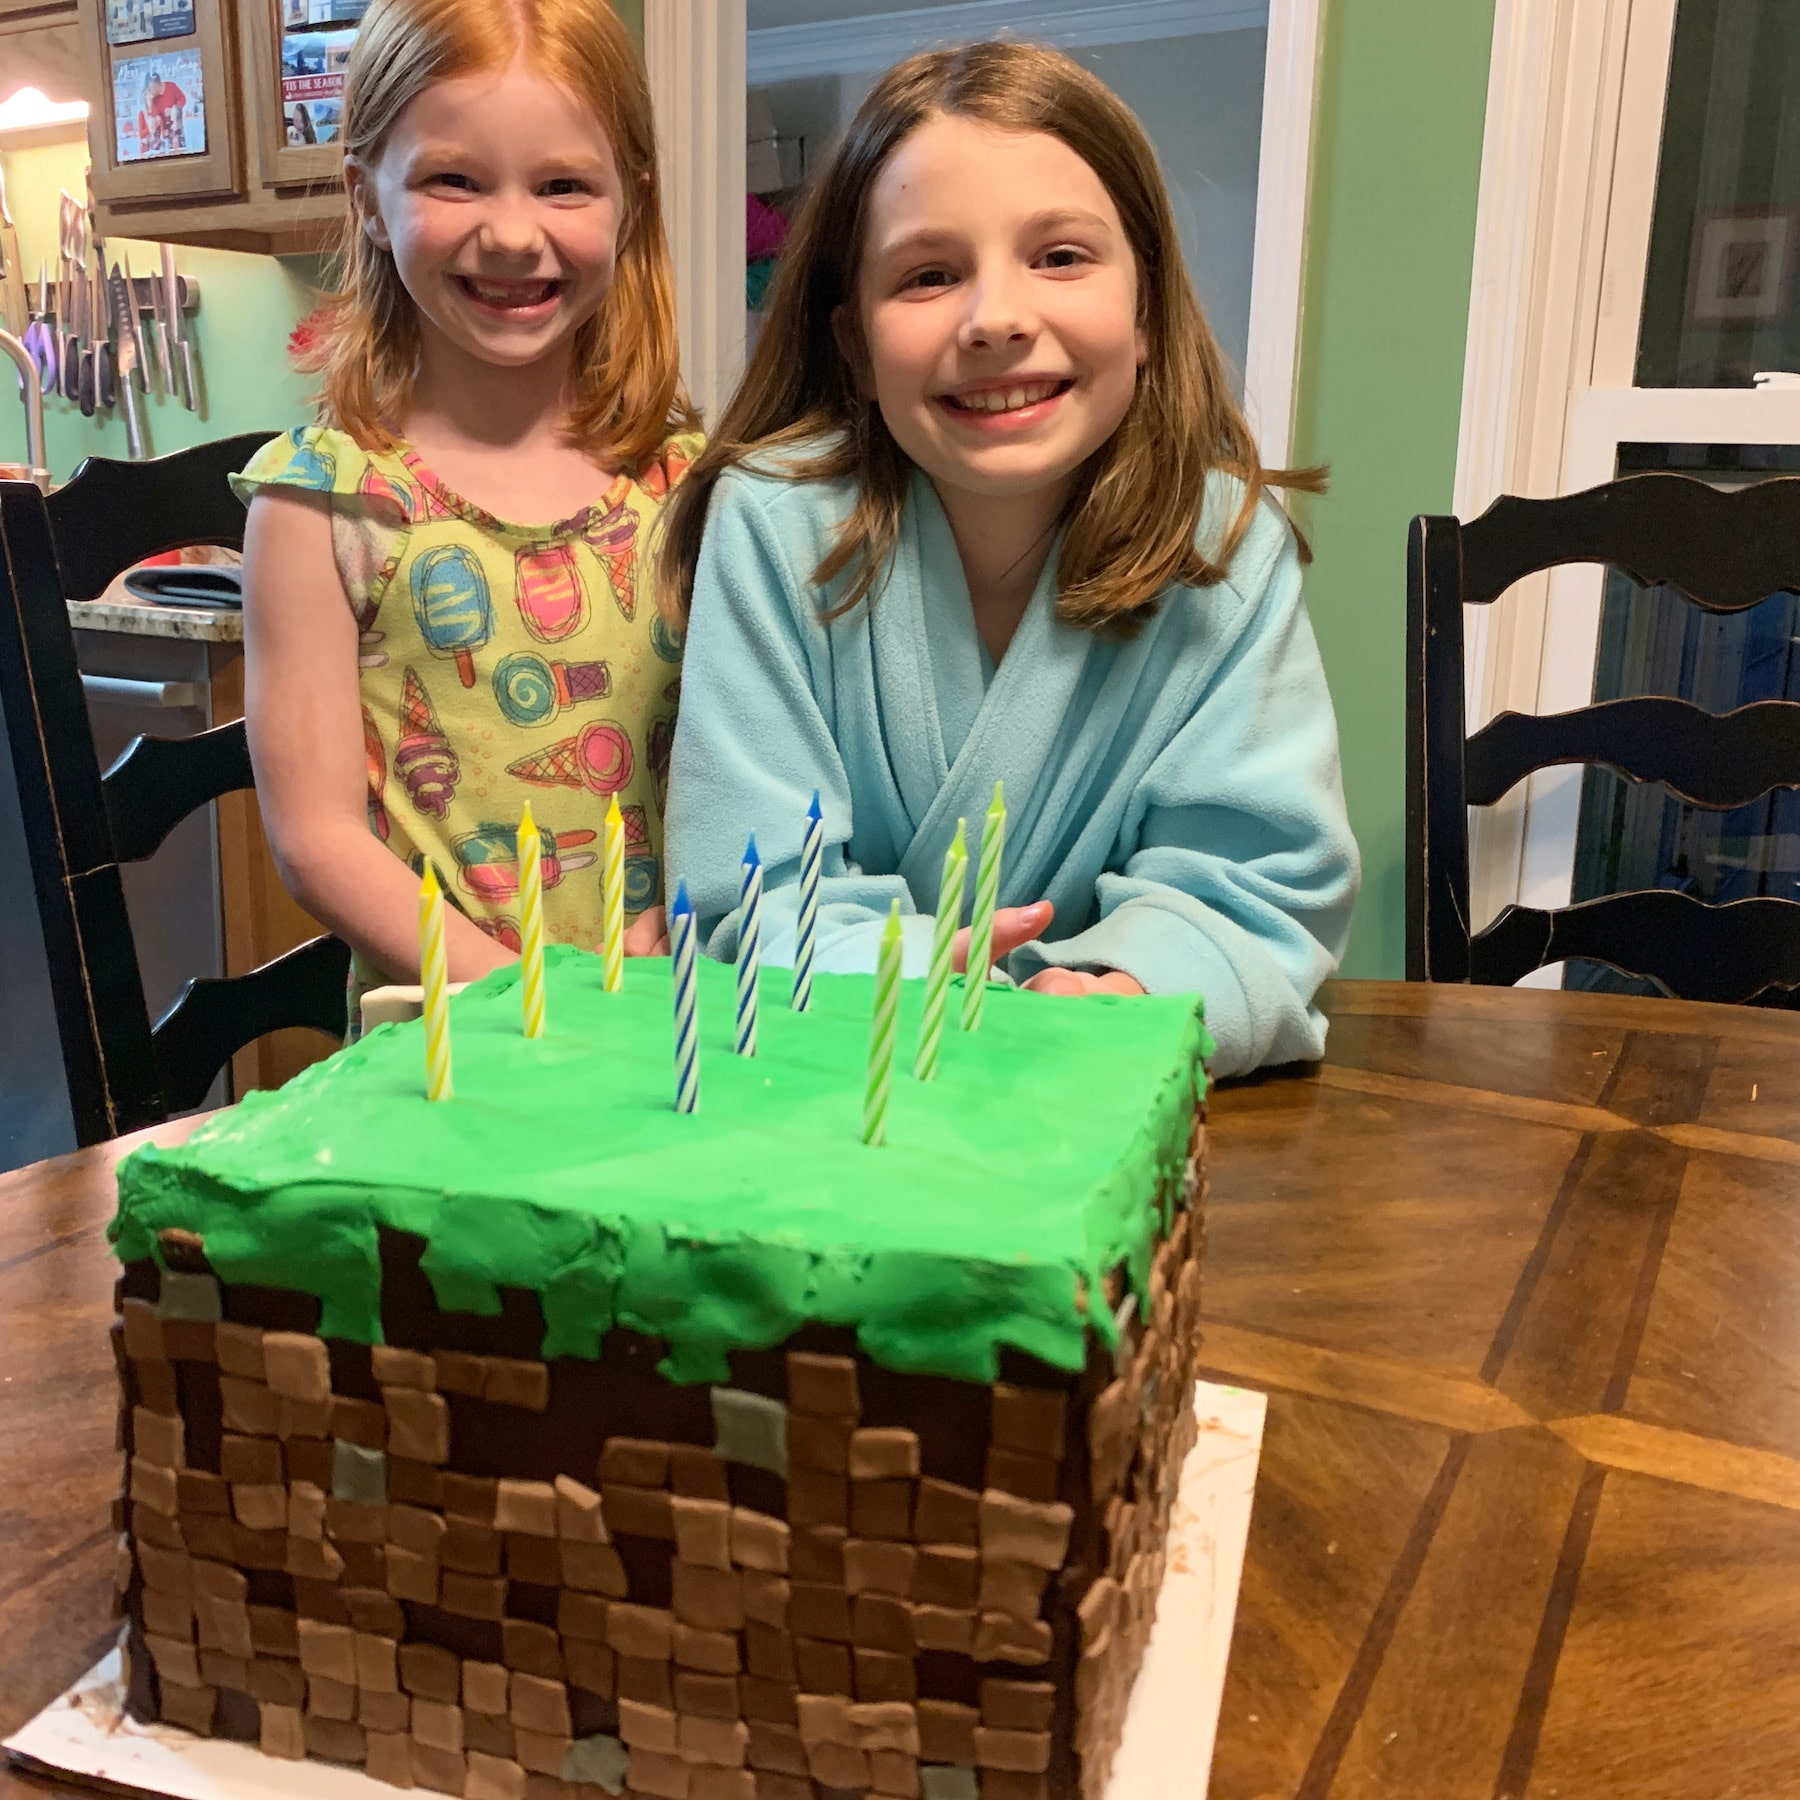 happy birthday e with minecraft cake